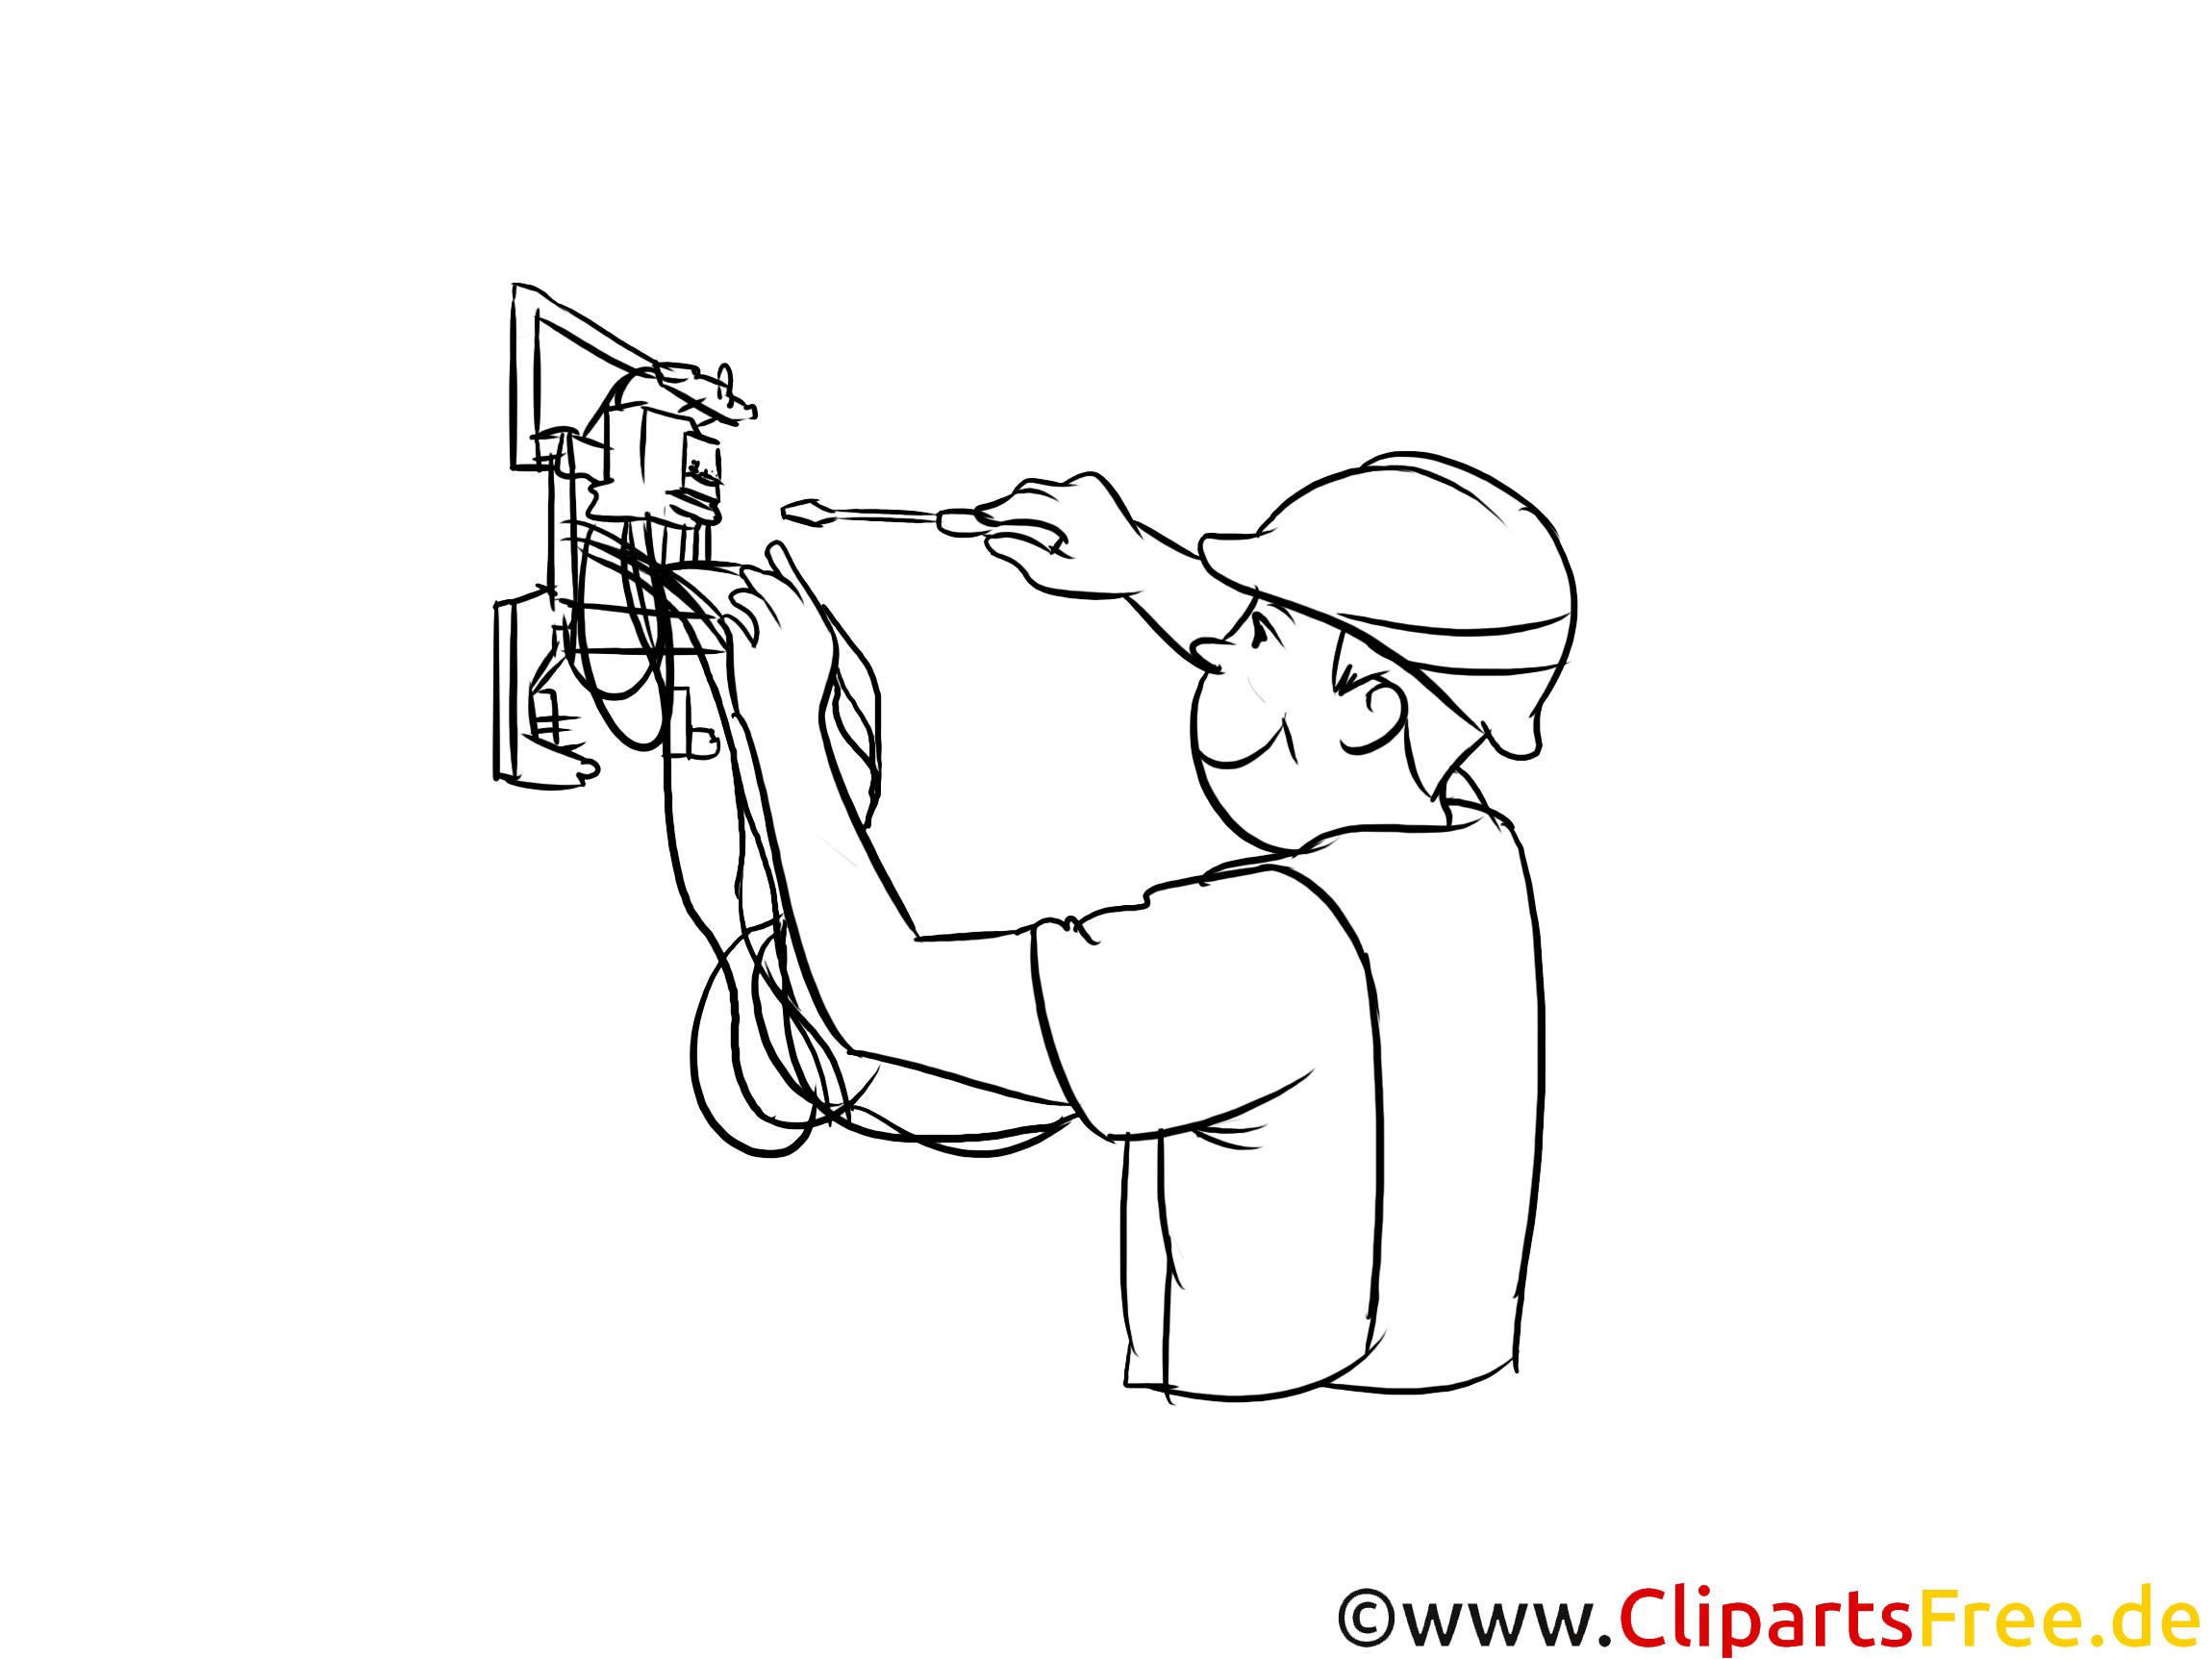 Elektroniker Clipart, Grafik, Bild schwarz-weiß